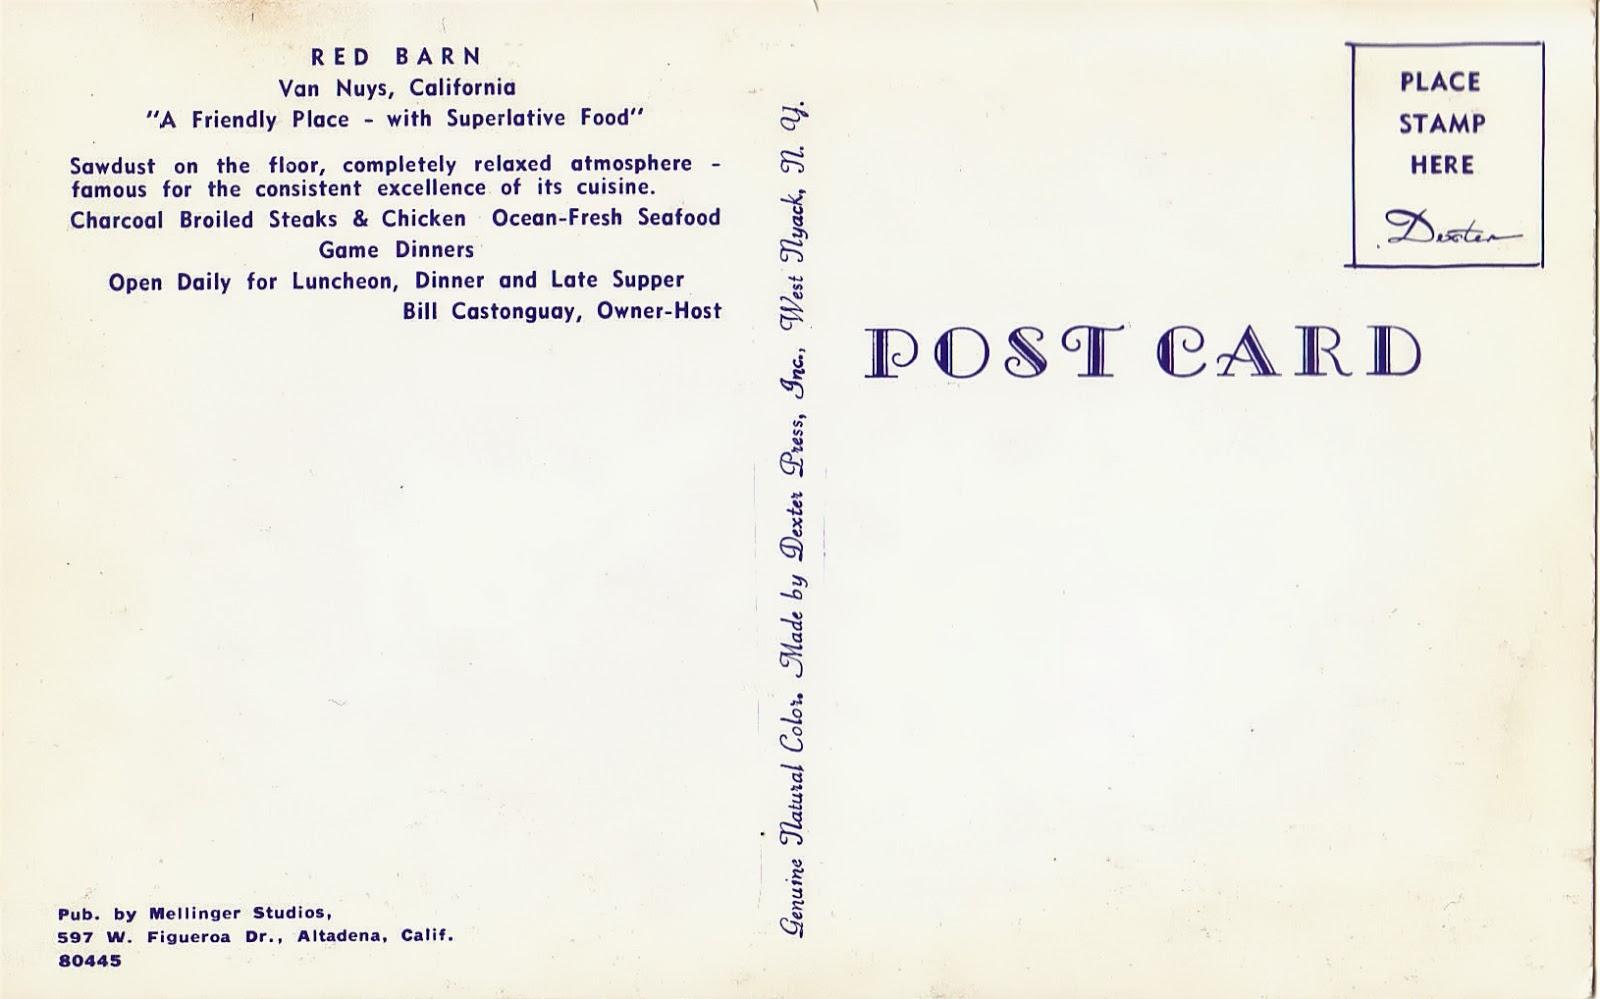 Celebrity Homes: Red Barn Restaurant in Van Nuys Postcard